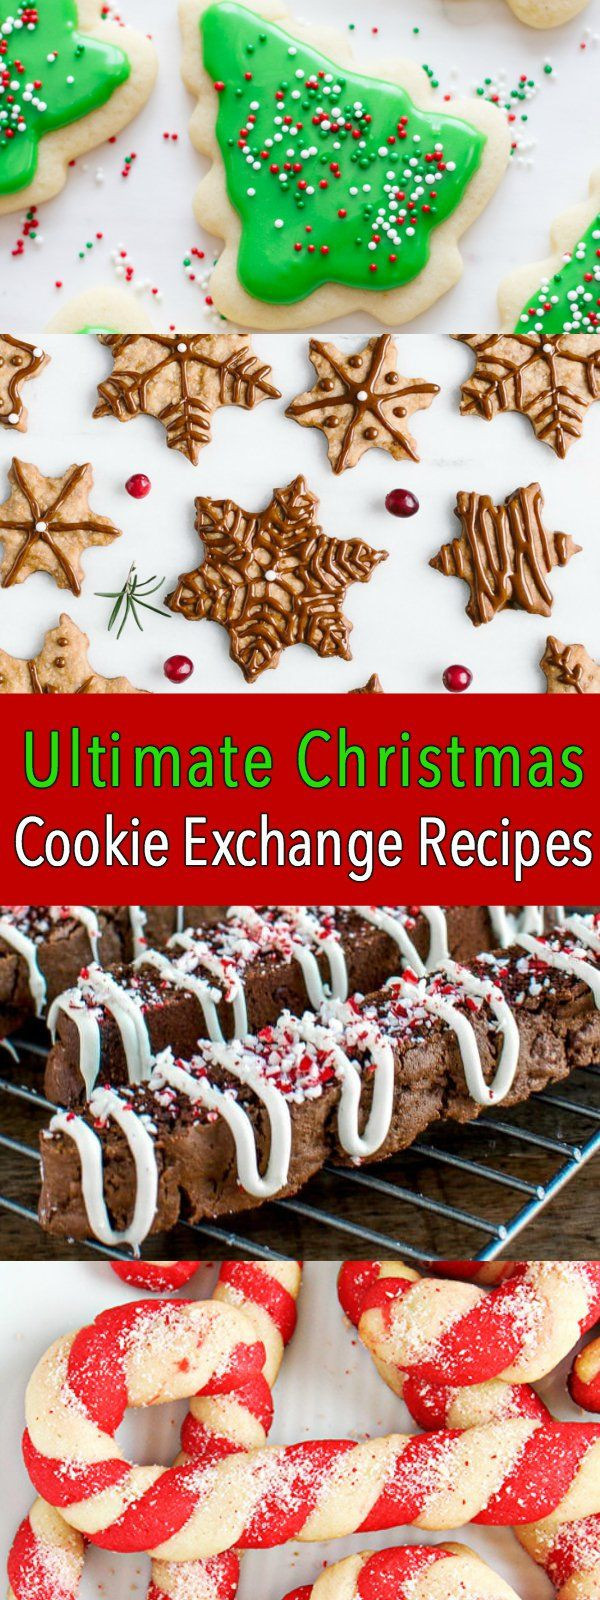 Christmas Cookies Recipe Pinterest  Best 25 Christmas cookie recipes ideas on Pinterest